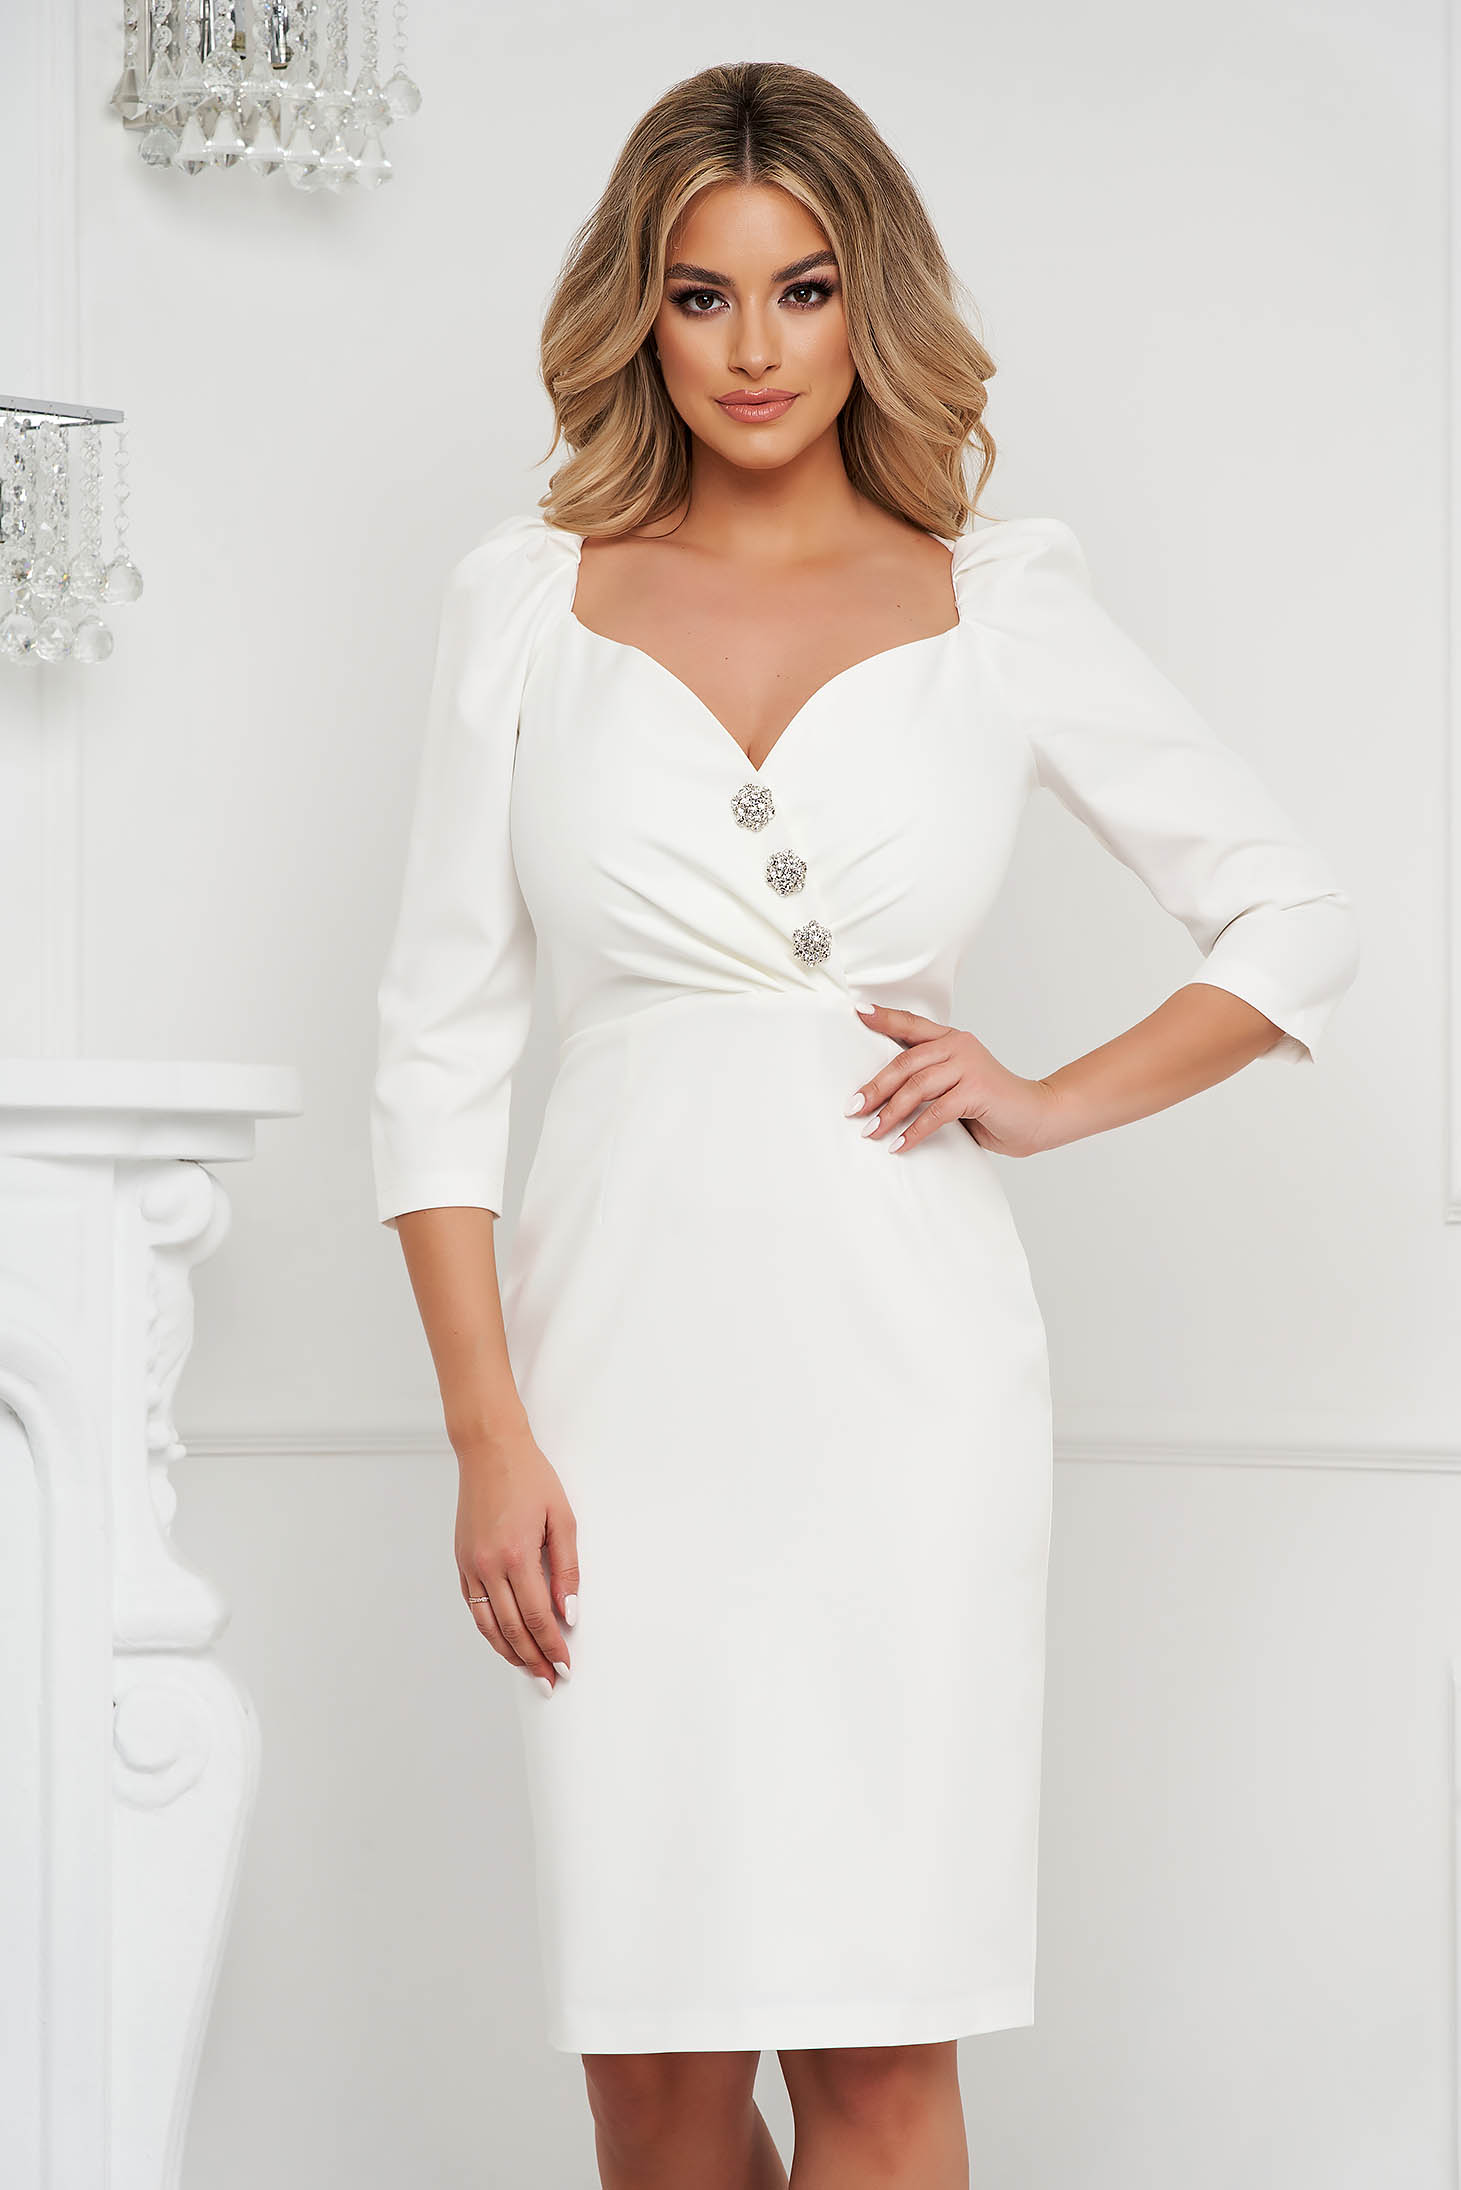 Dress white elegant midi pencil buttons with shiny stones